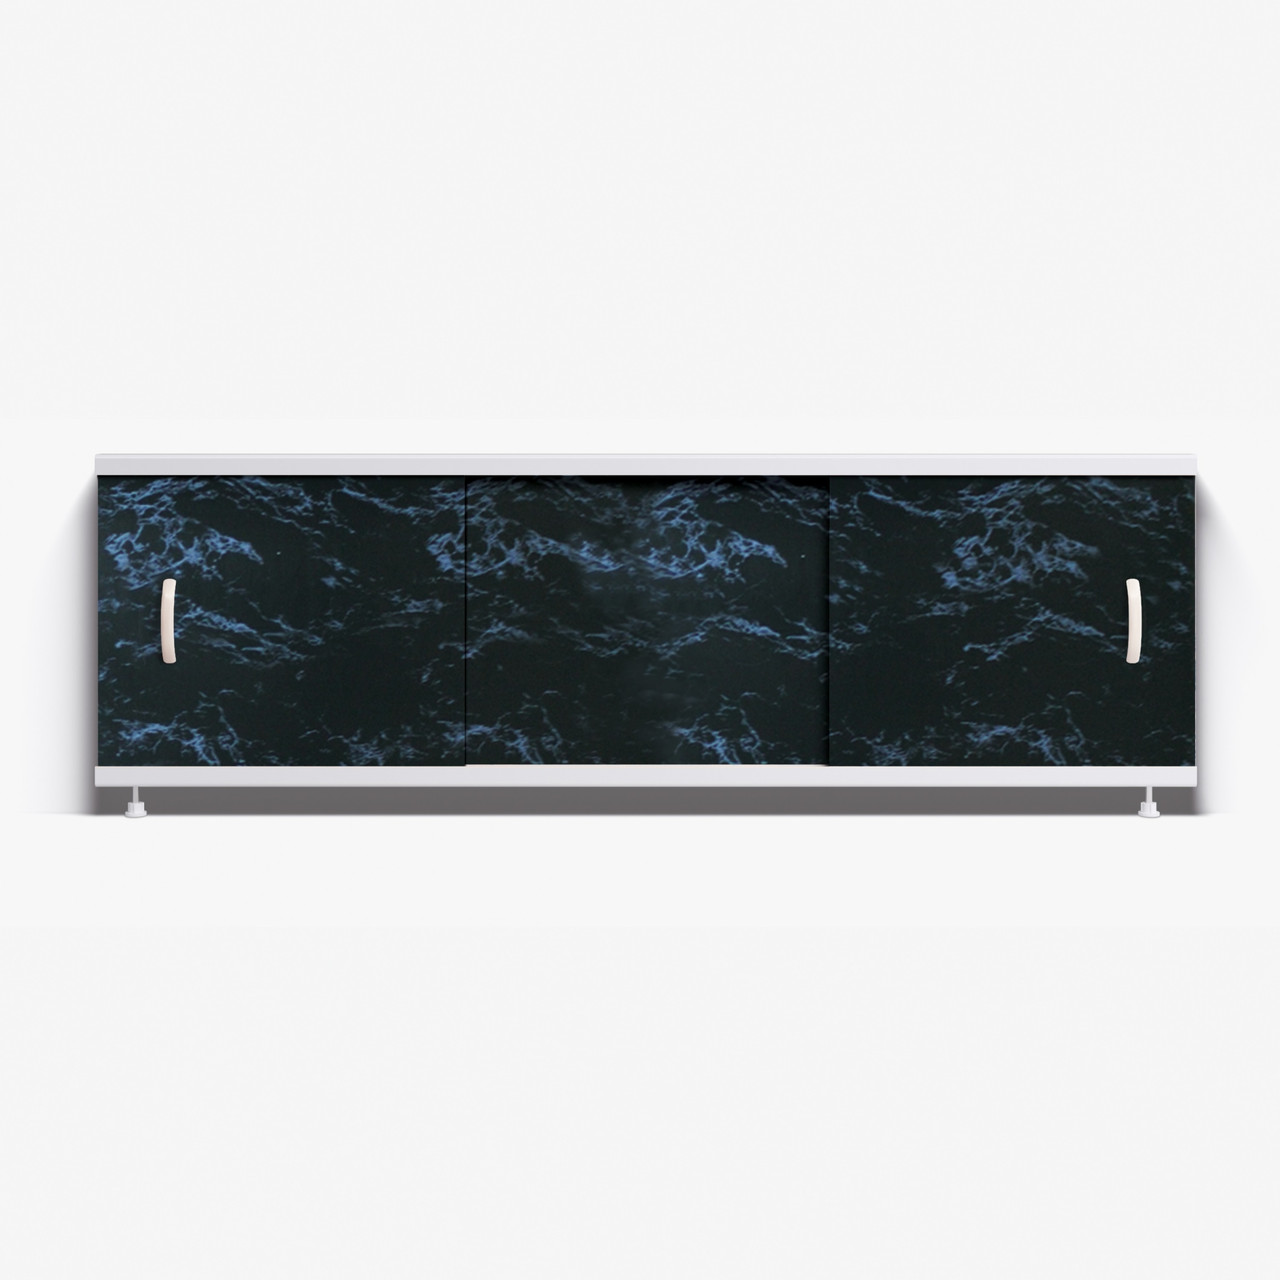 Панель для ванны Alavann Престиж 1.7 м   // 25 черный мрамор